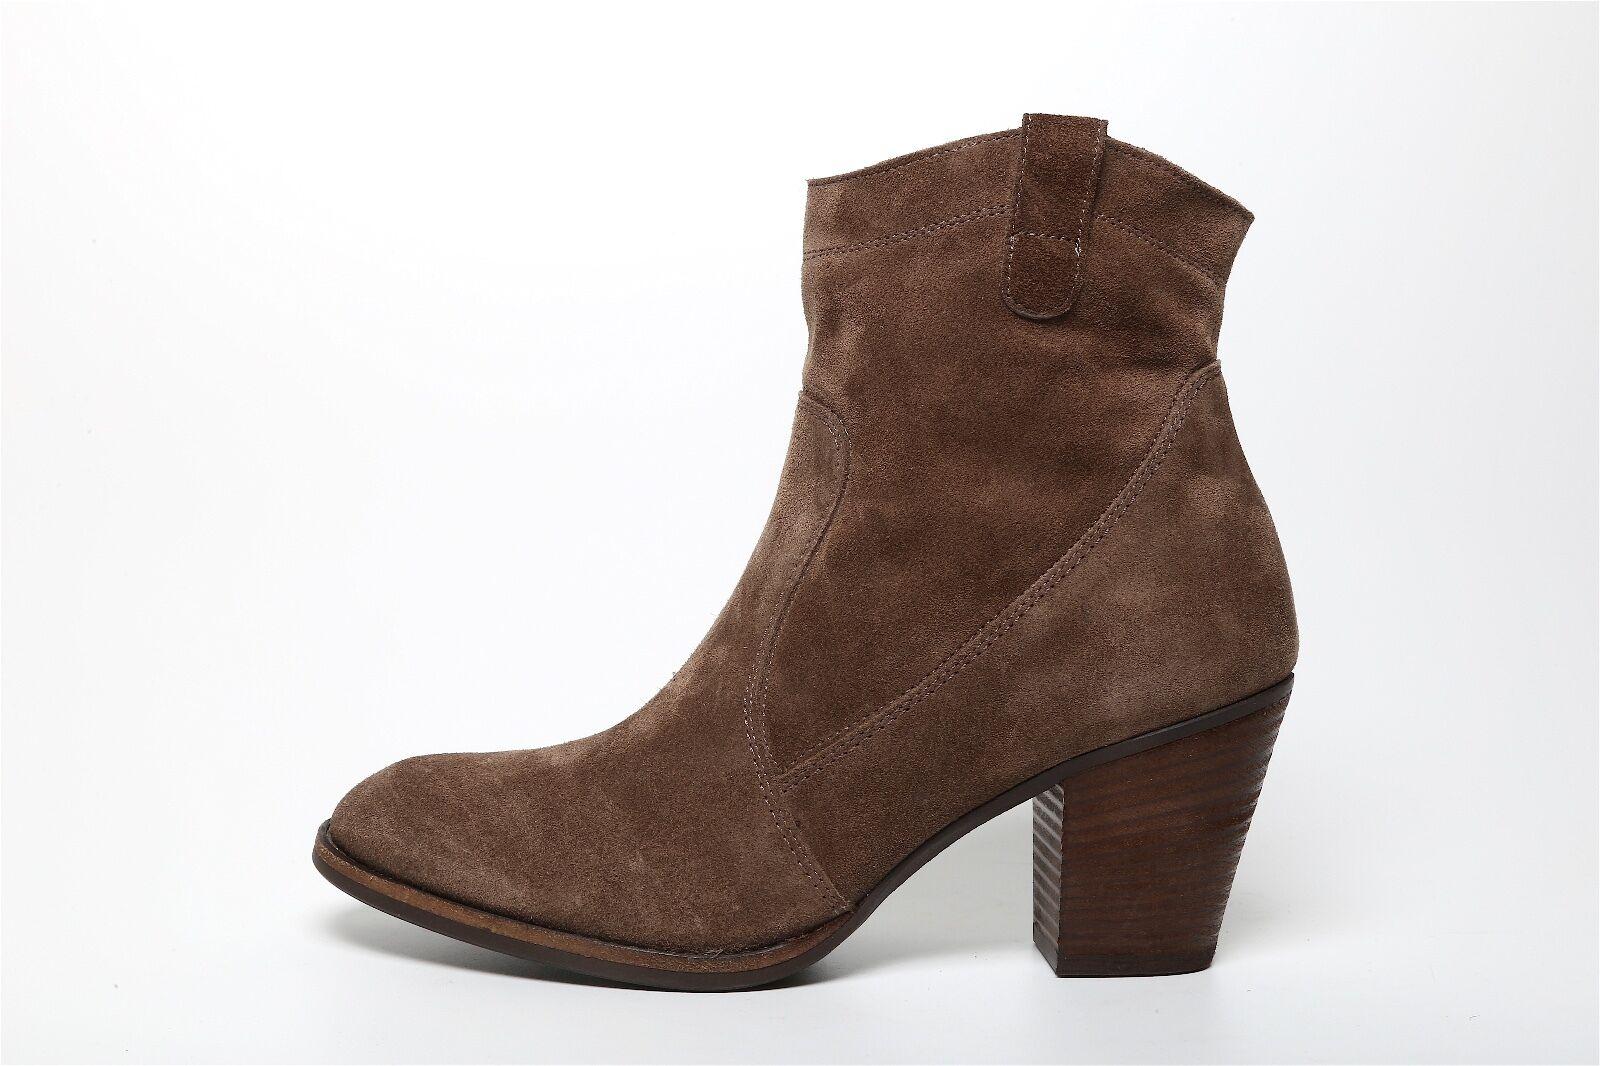 marchi di stilisti economici Paul verde Donna  Suede Marrone Jax Jax Jax avvioies 6199 Sz 7 UK  negozio online outlet